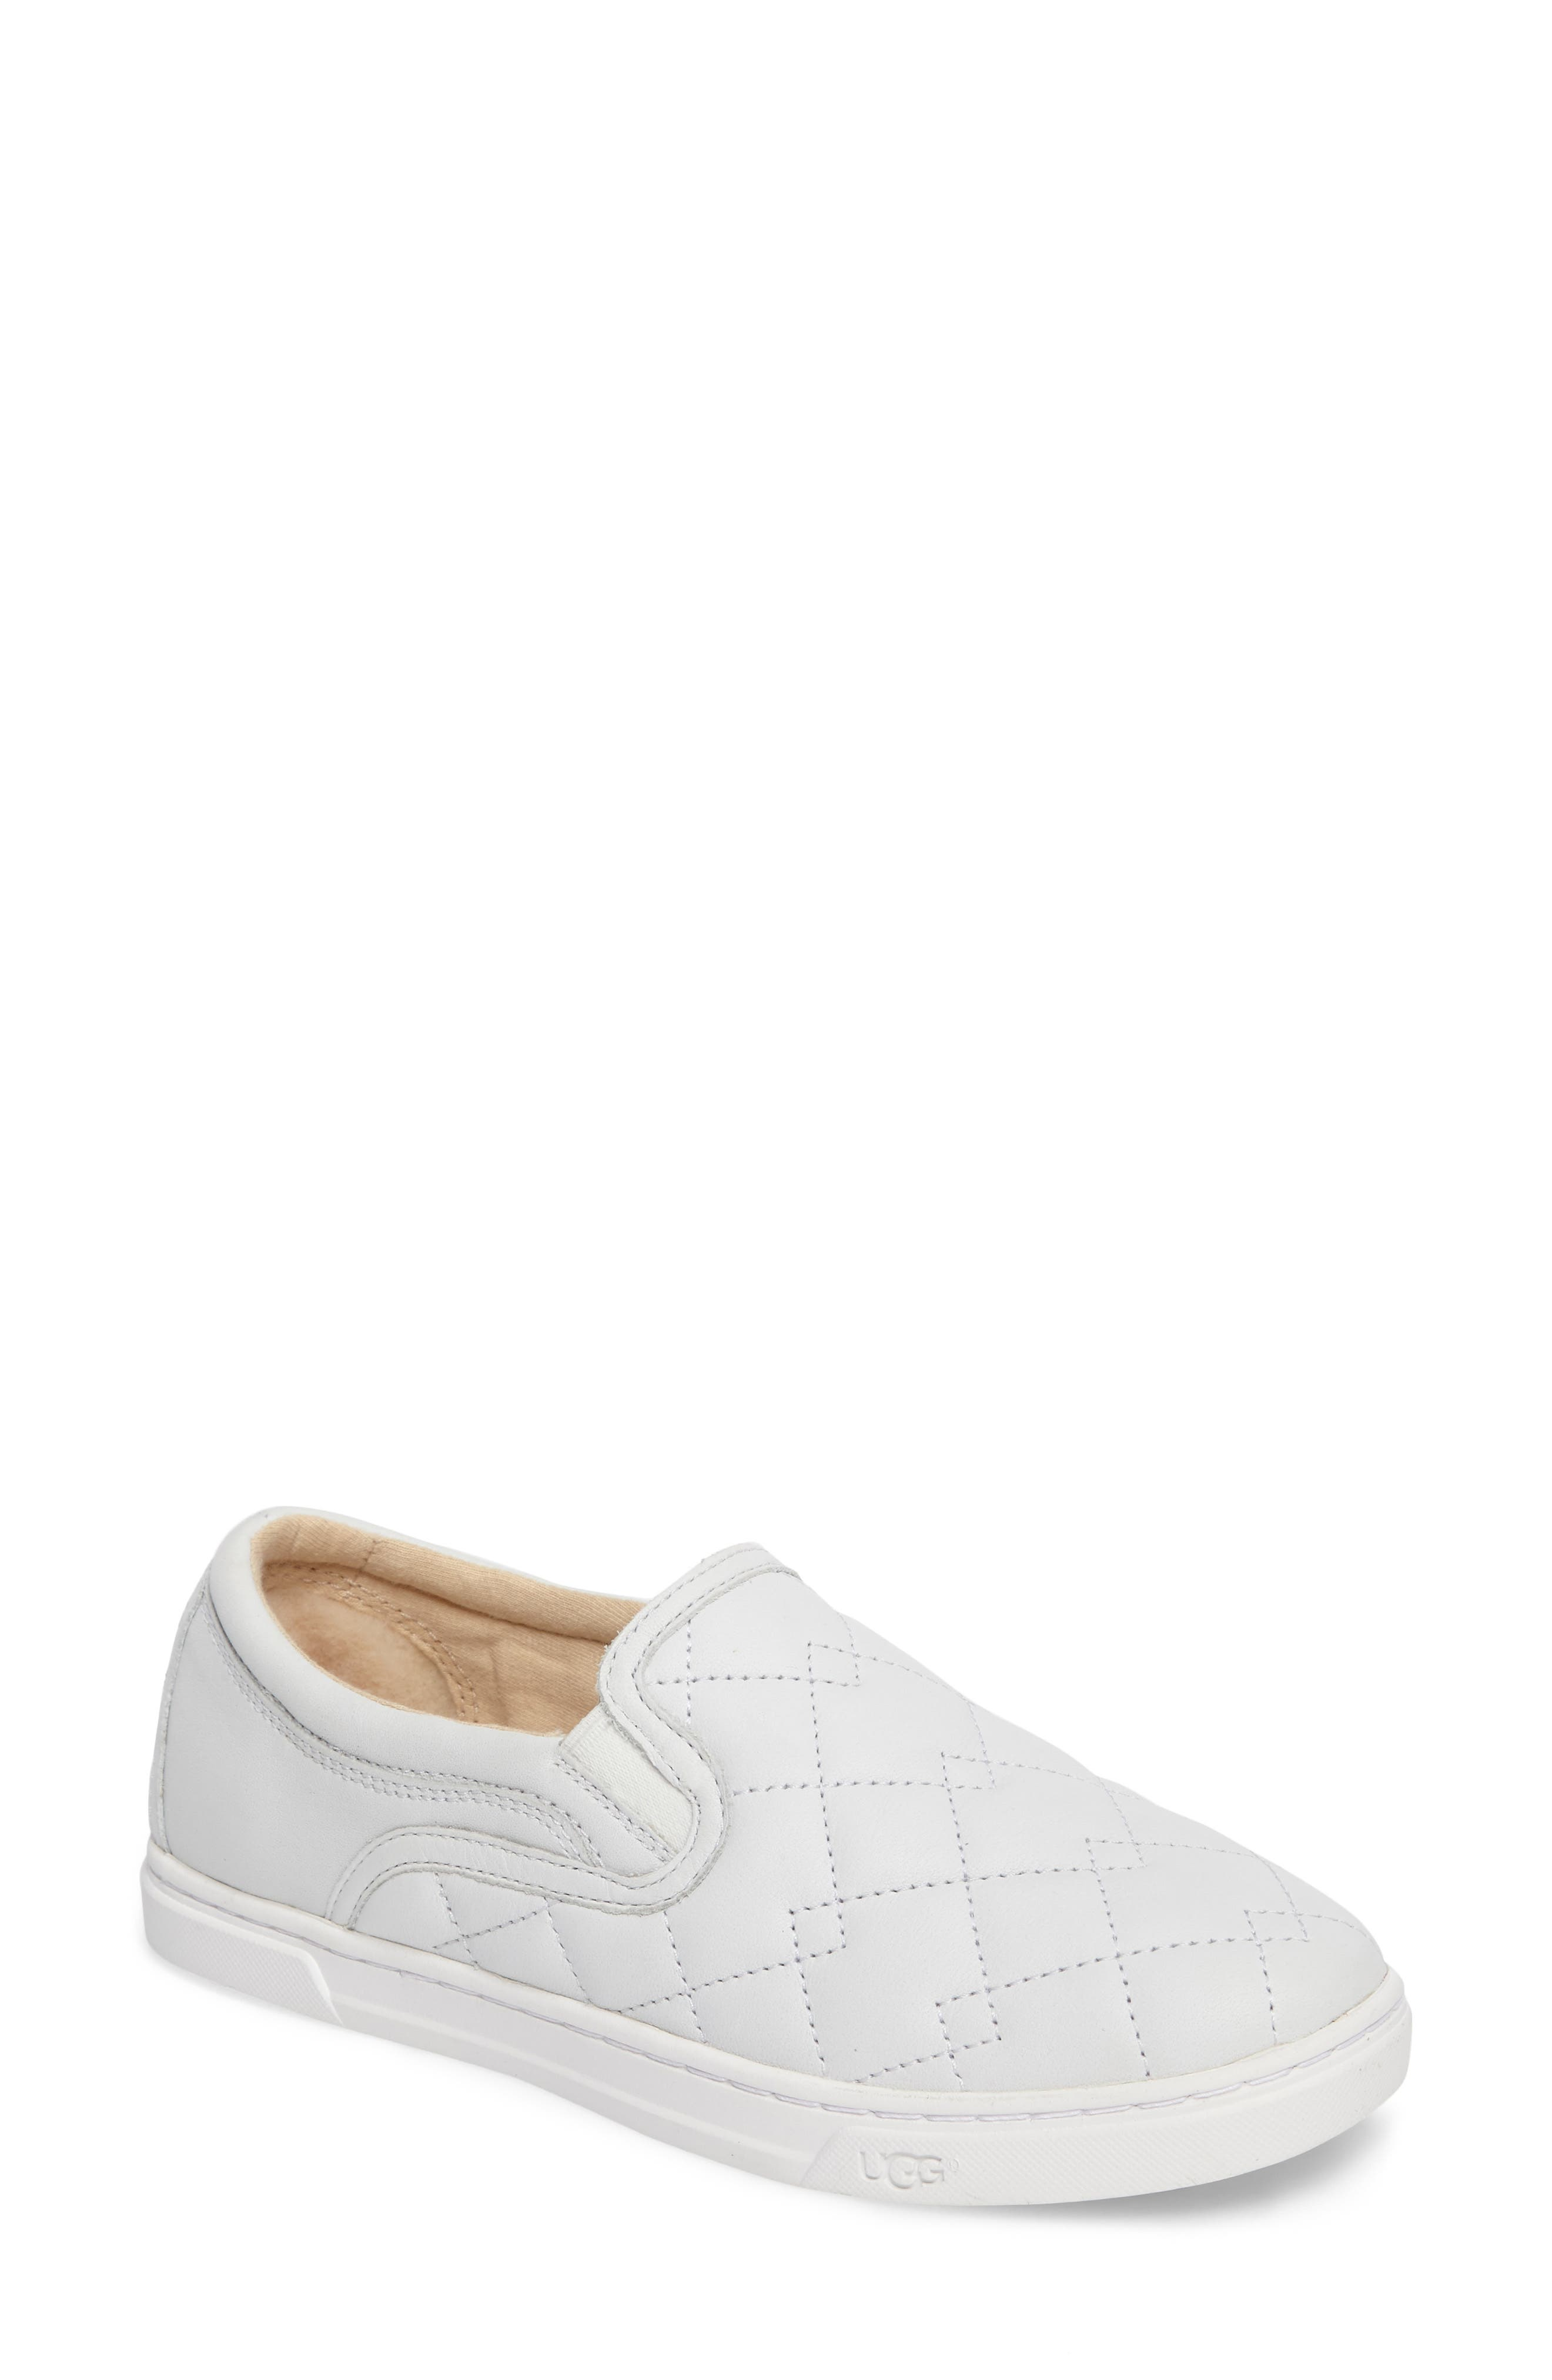 Main Image - UGG® Fierce Deco Quilted Slip-On Sneaker (Women)